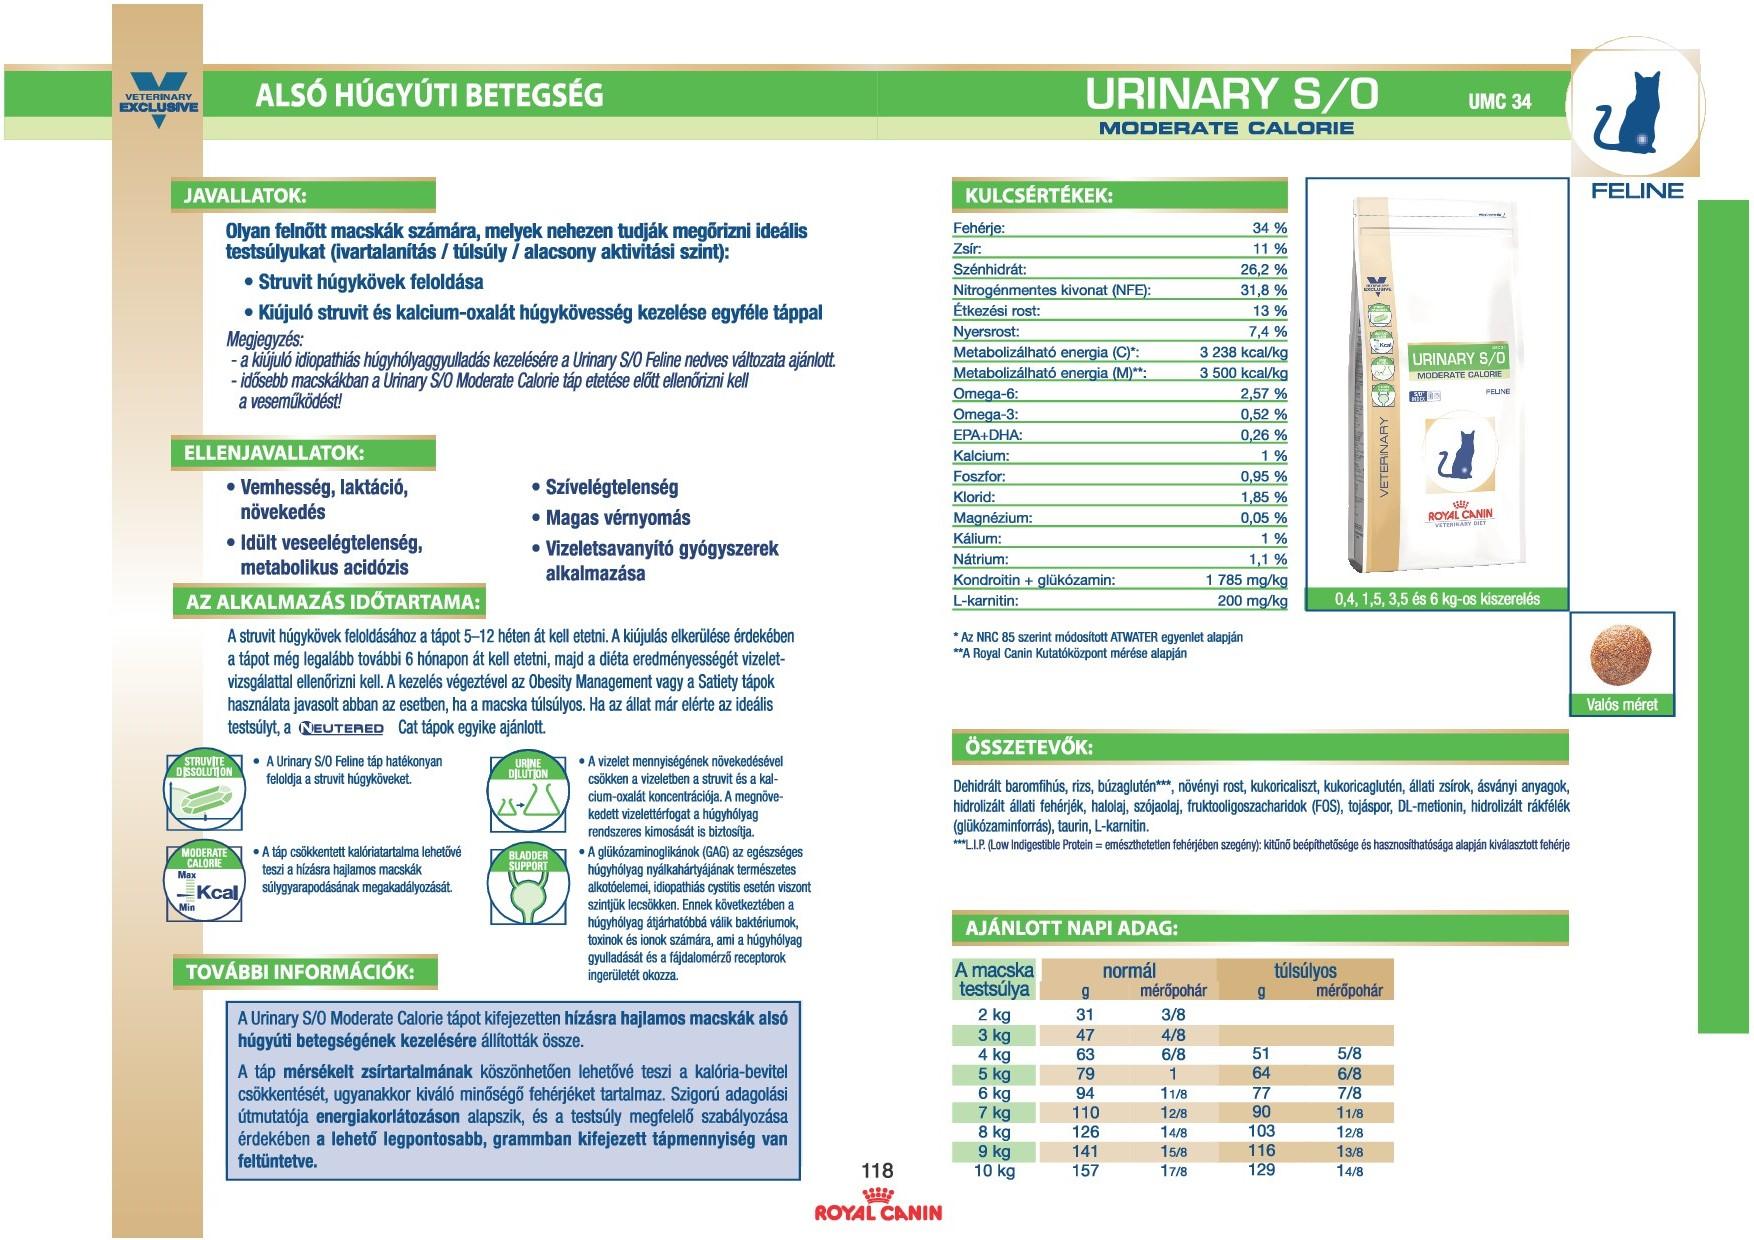 PharmaOnline - Óvatosan a bromokriptinnel!